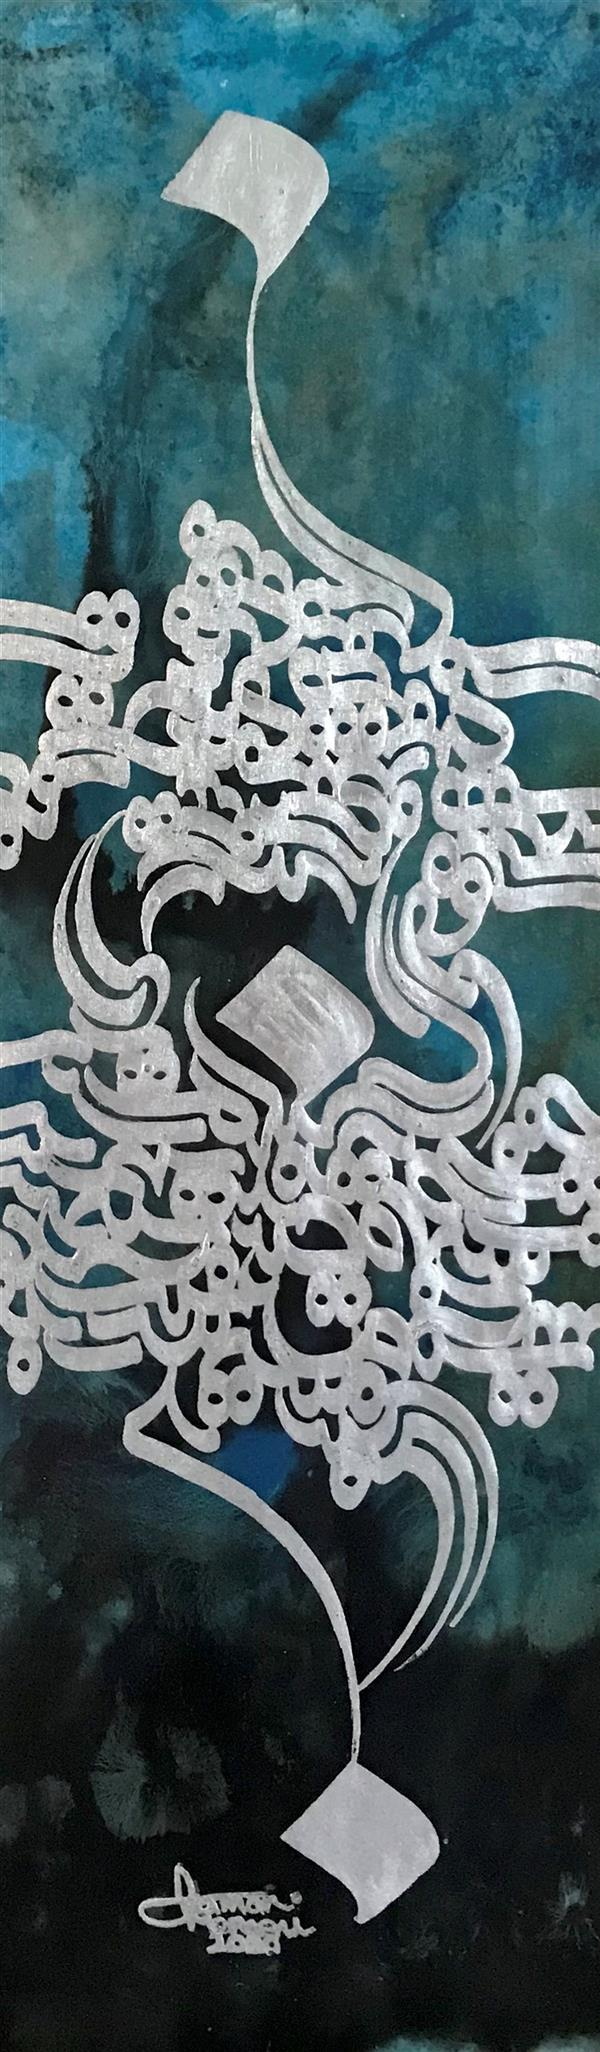 هنر خوشنویسی محفل خوشنویسی کورش مومنی . در آغوشِ آسمان  Embrace the sky Mix media on paper 2019 15*50 cm با قاب و پاسپارتو #art#calligraphy#calligraphyart#calligraphypainting#kereshmeh_shirin#kereshmeh#naghashikhat #کرشمه_شیرین #کرشمه #خوشنویسی #نقاشیخط